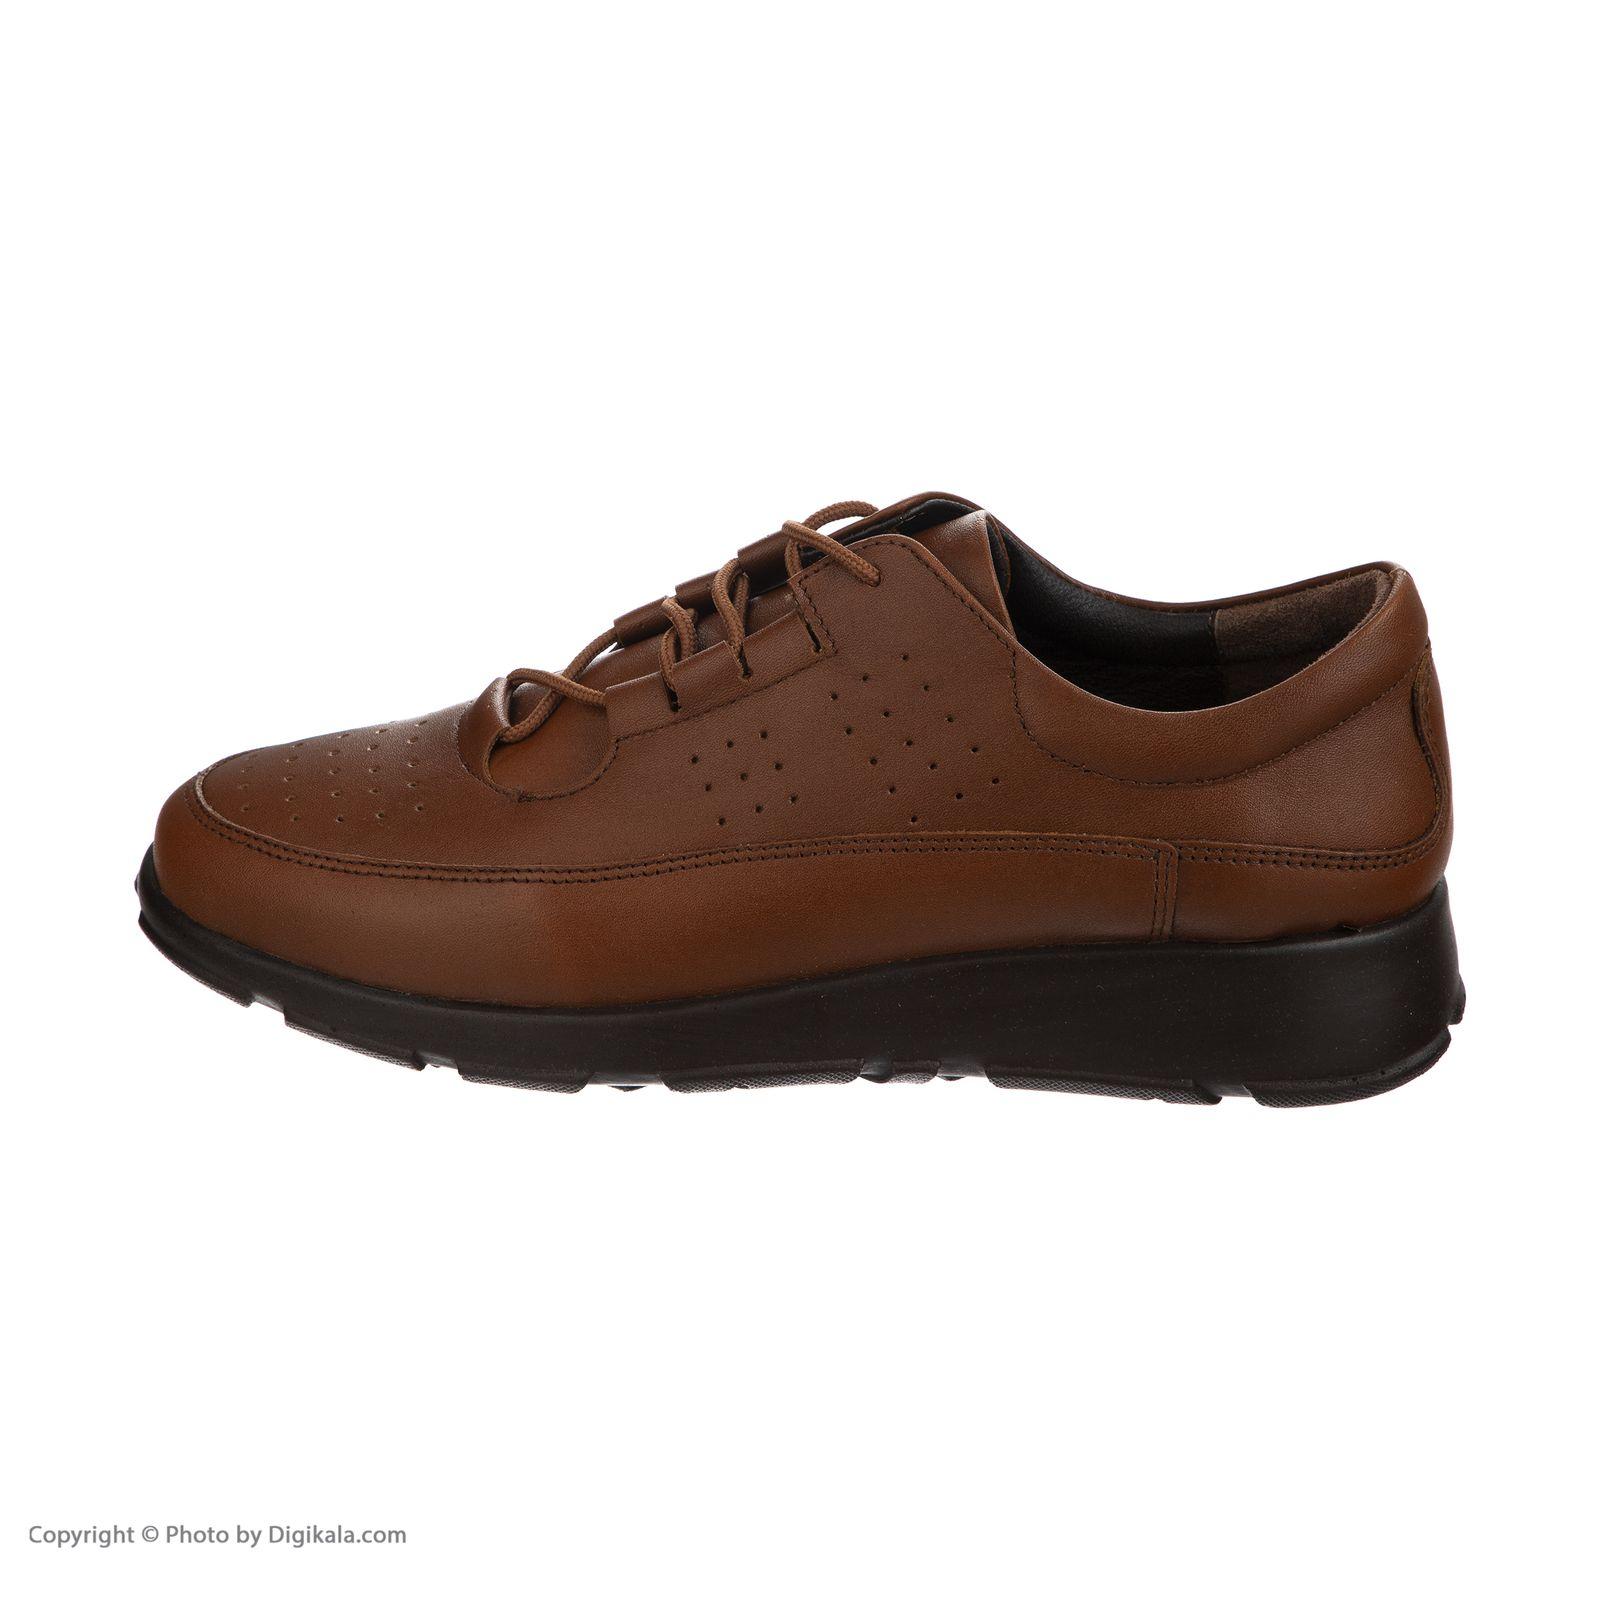 کفش روزمره زنانه شیفر مدل 5289A500136 -  - 3